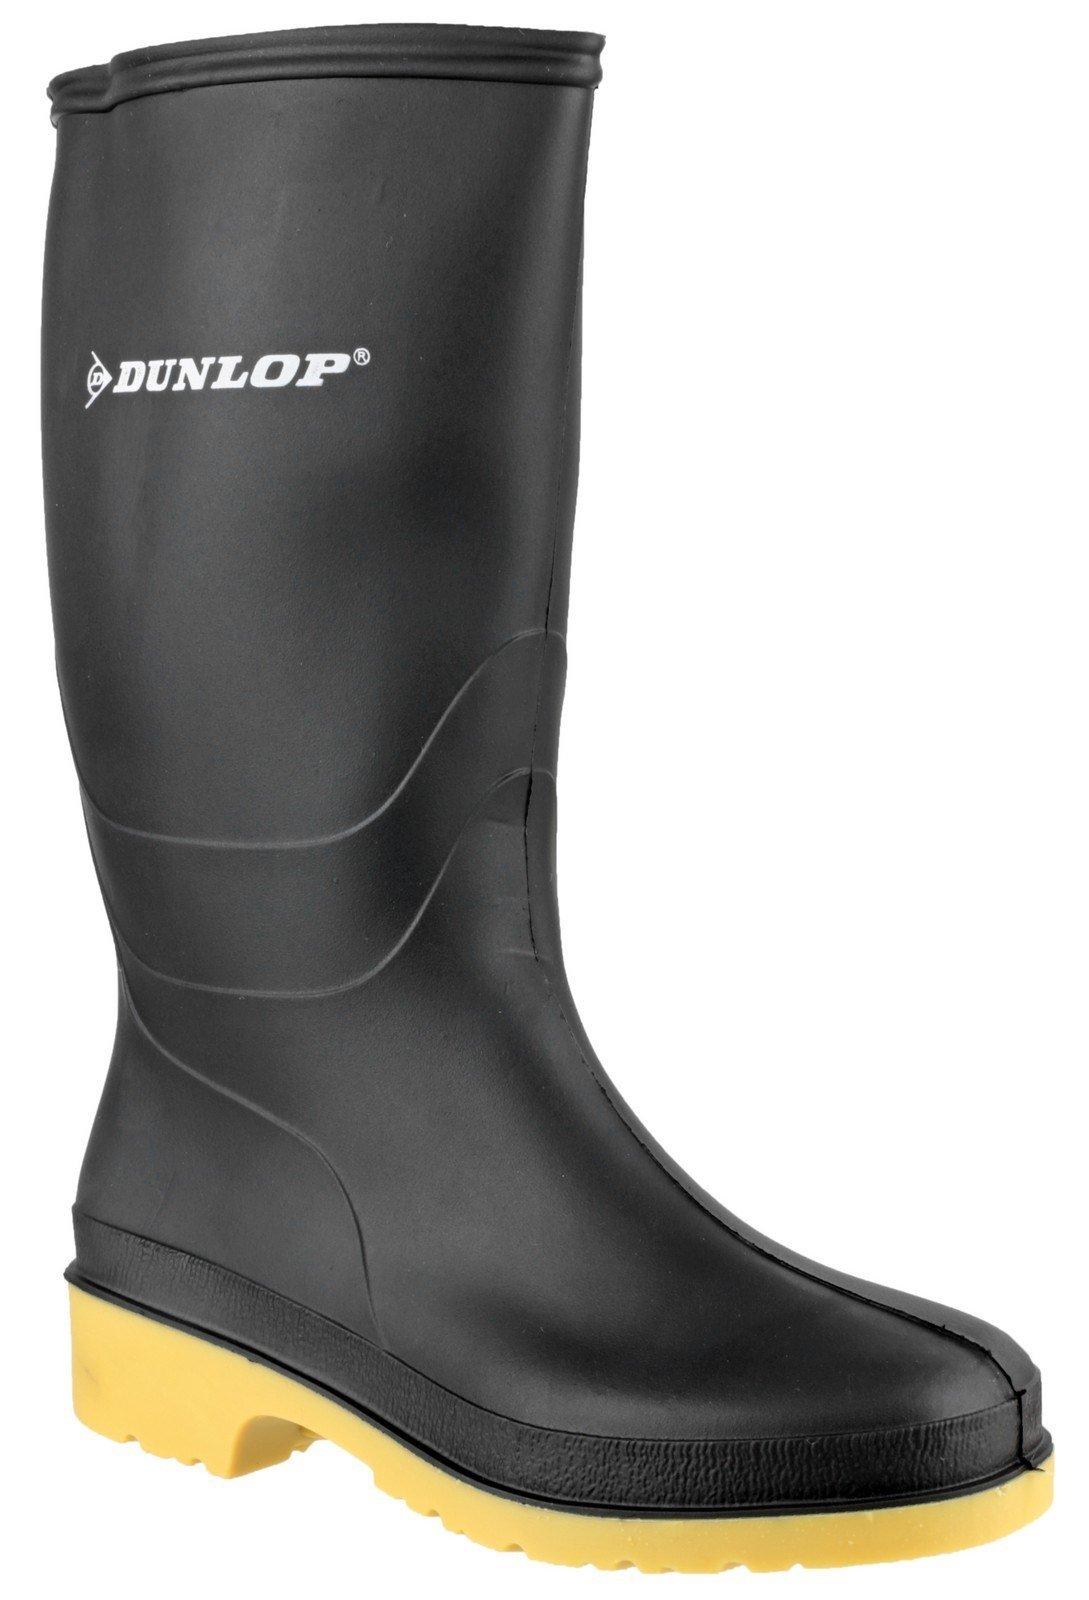 Dunlop Kids Dull Wellington Boots Black 22233 - Black 10 UK